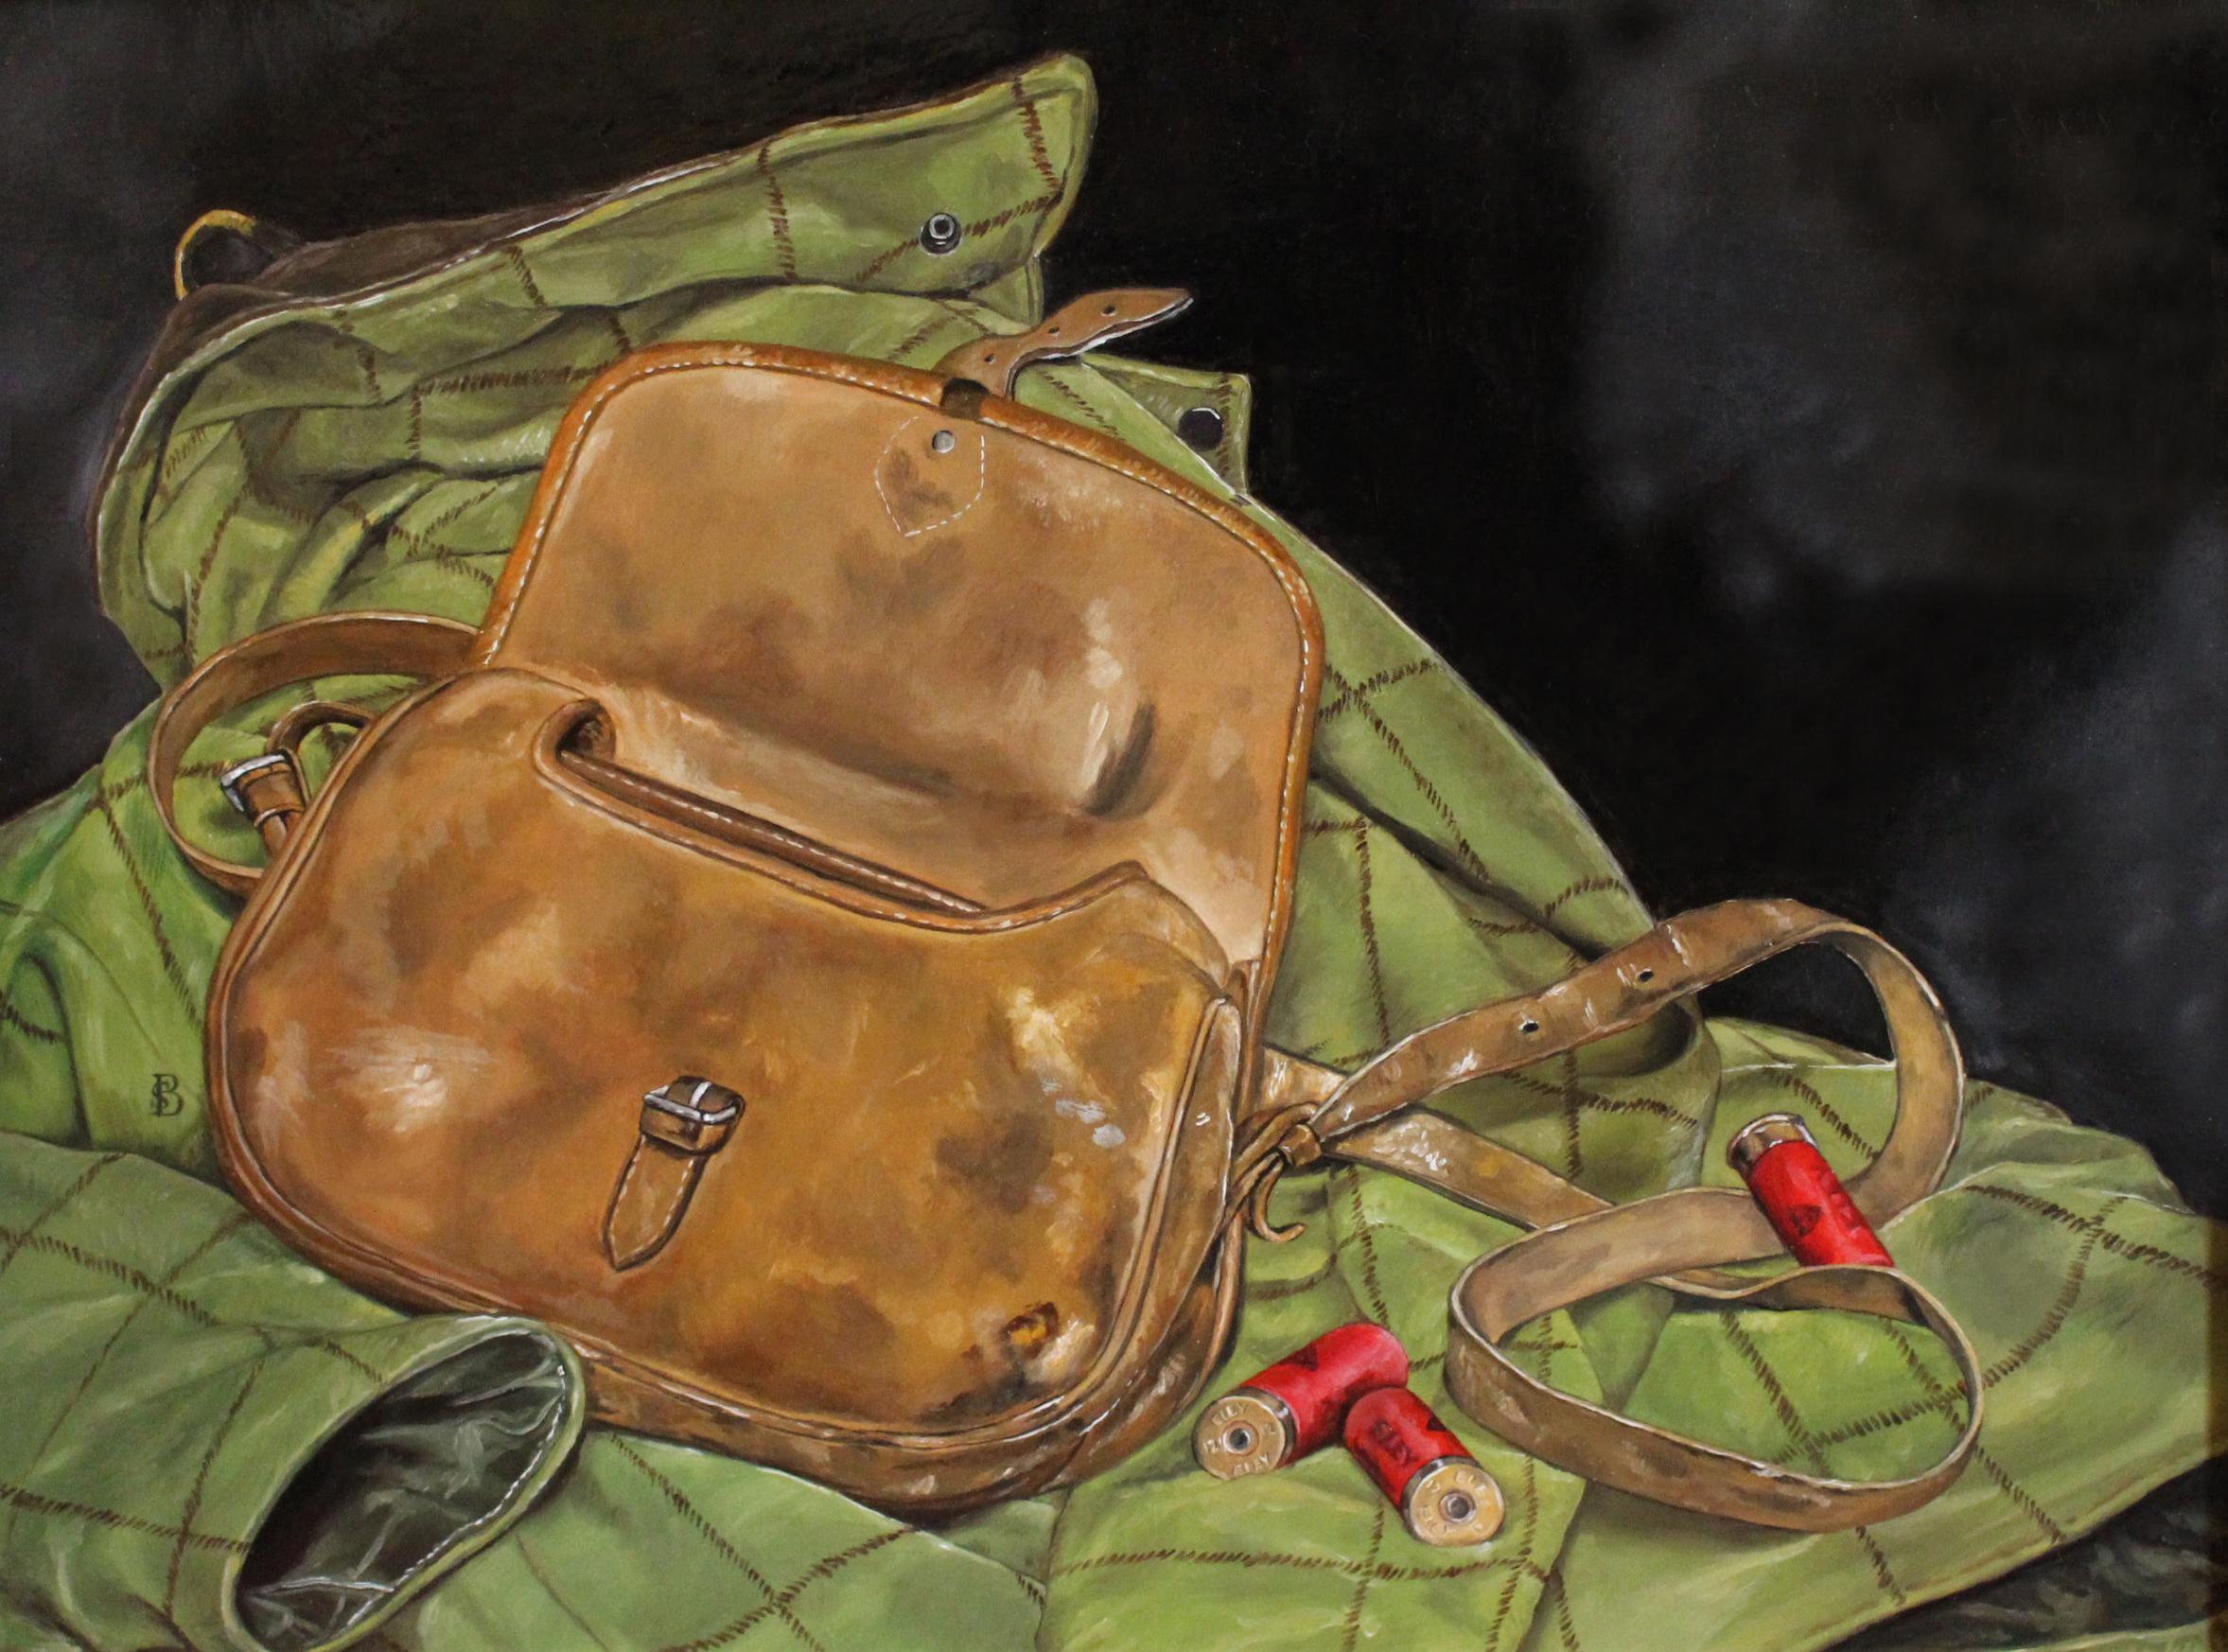 CARTIRDGE BAG, CARTRIDGES & COAT